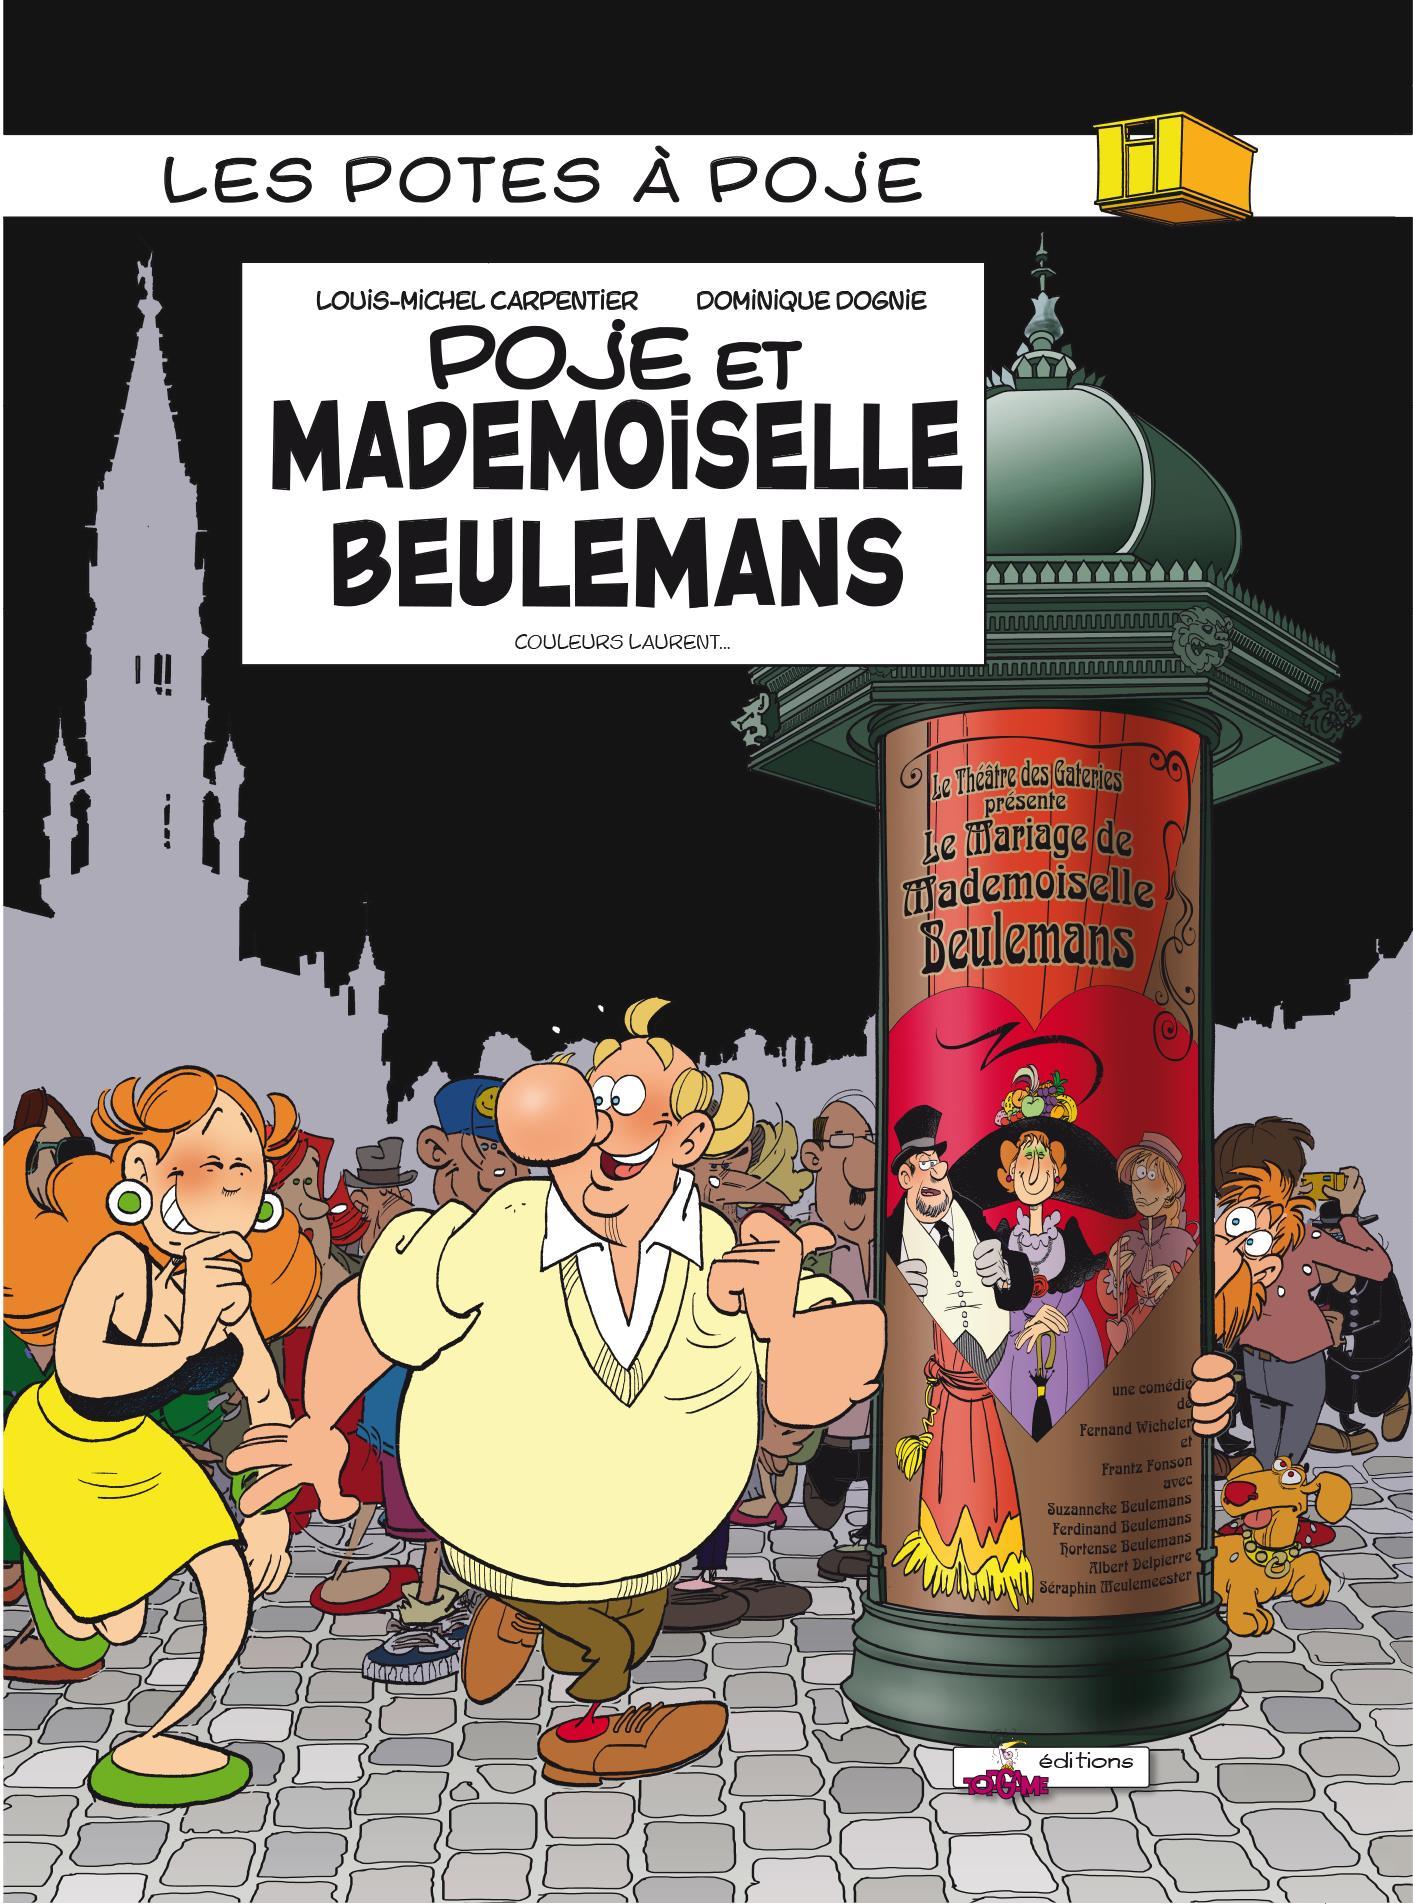 mademoiselle Beulemans